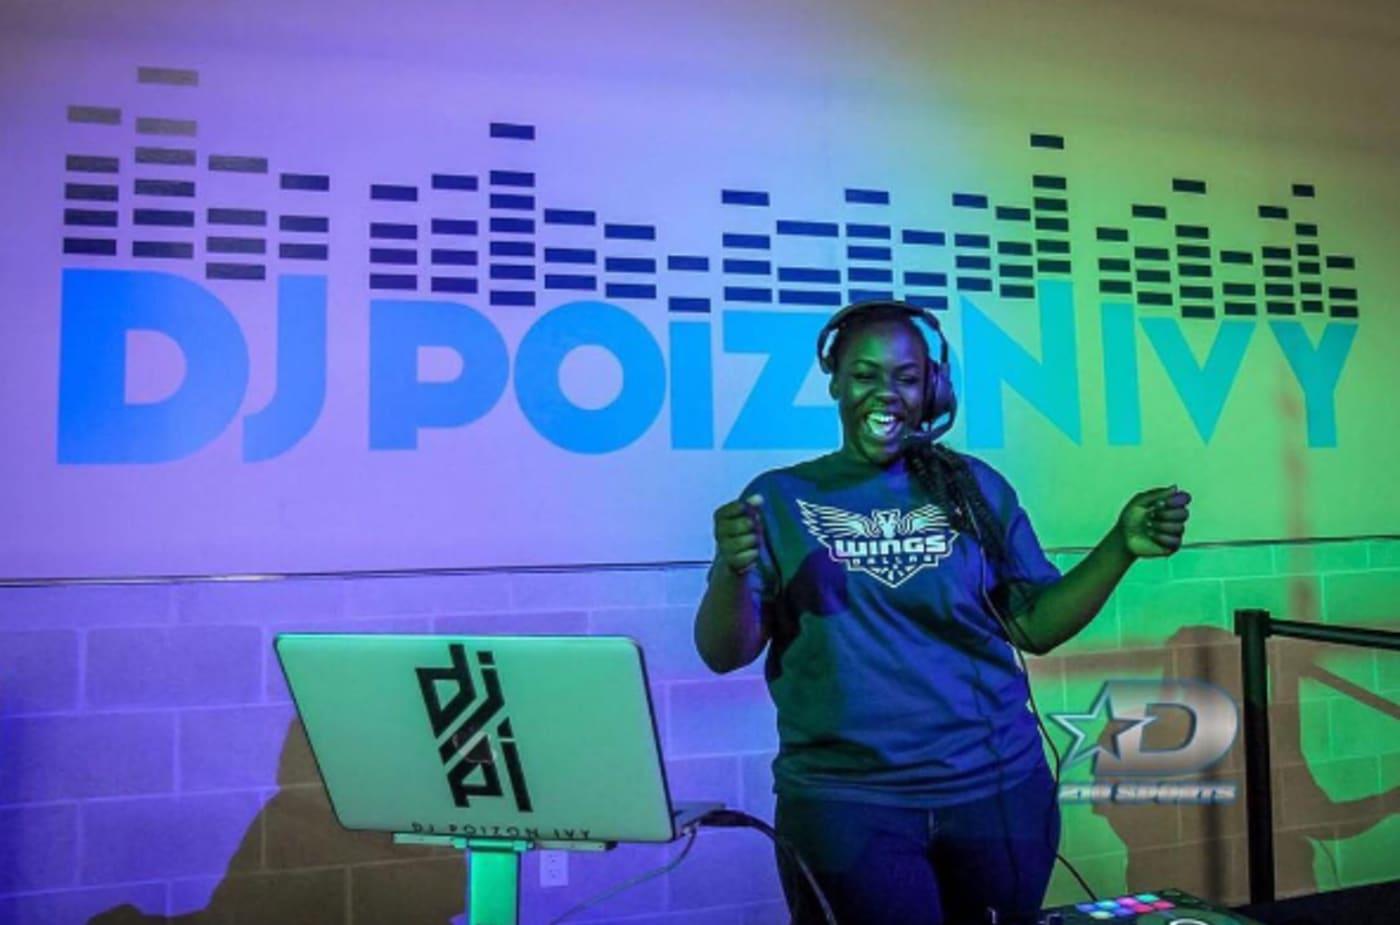 DJ Poizon Ivy